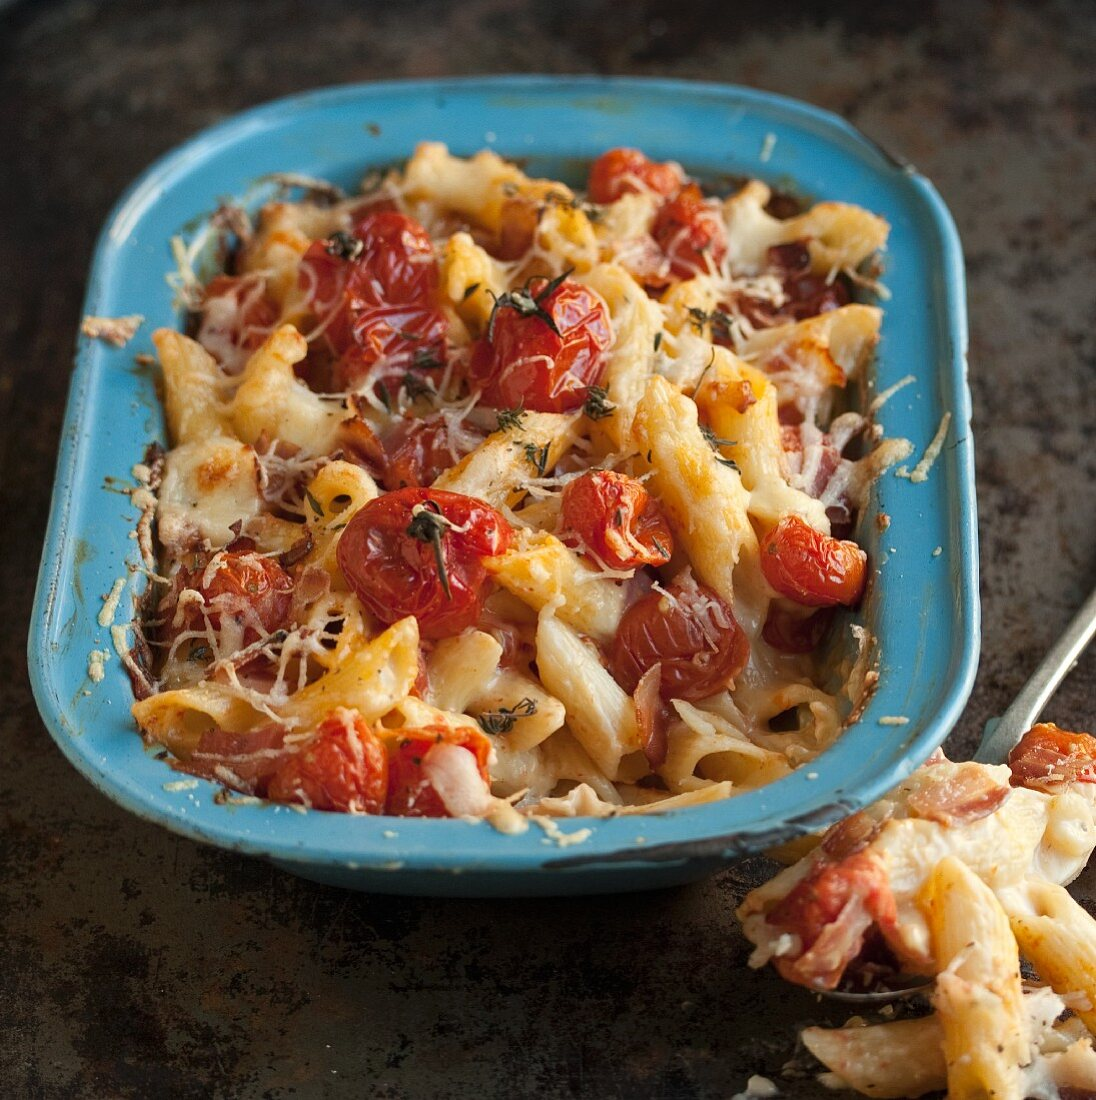 Macaroni cheese with tomatoes